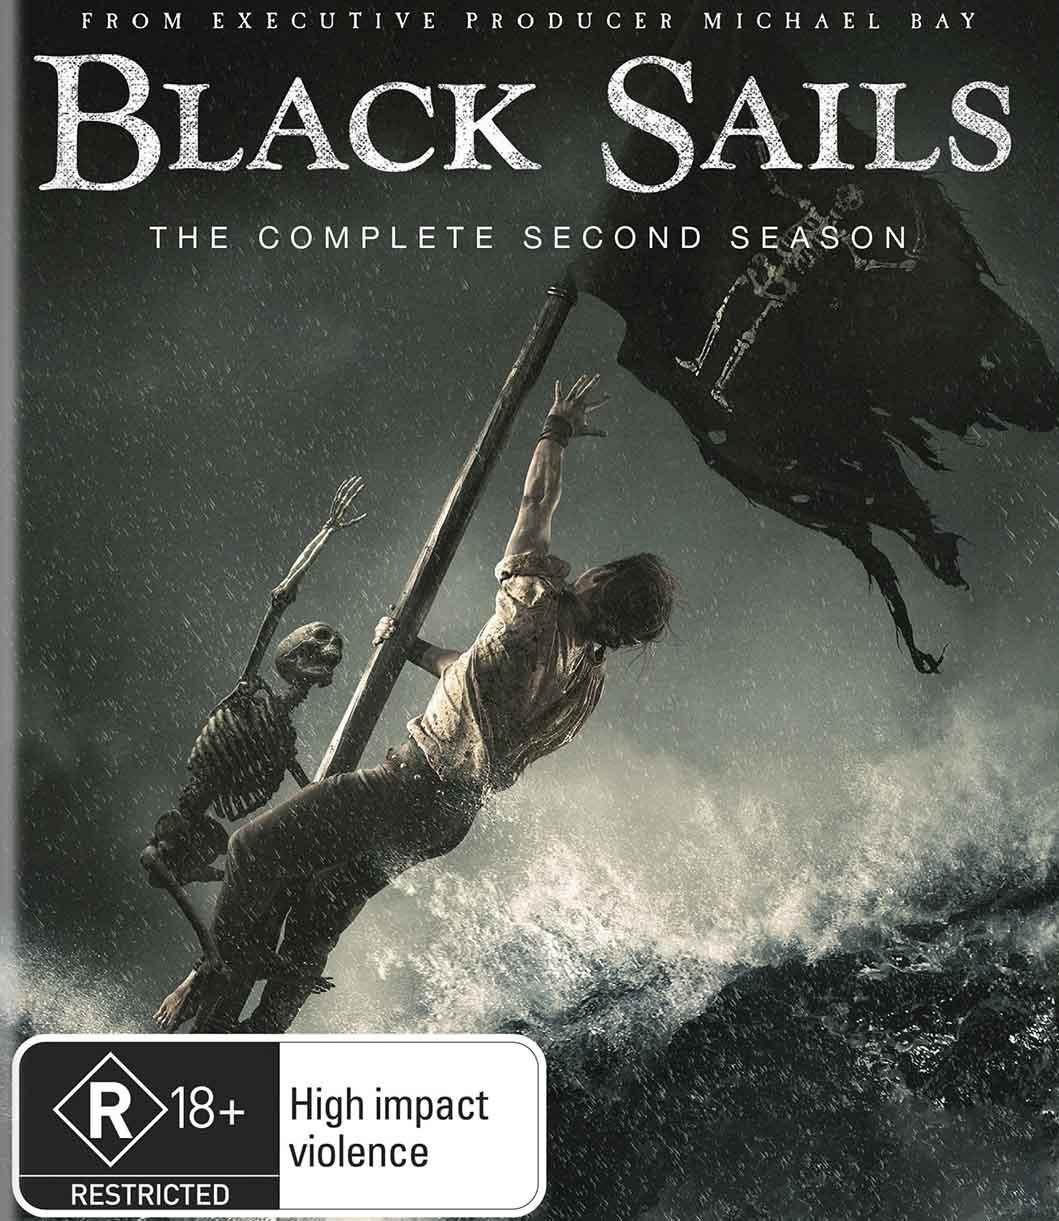 Black Sails 2ª Temporada Torrent - WEB-DL 720p Dual Áudio